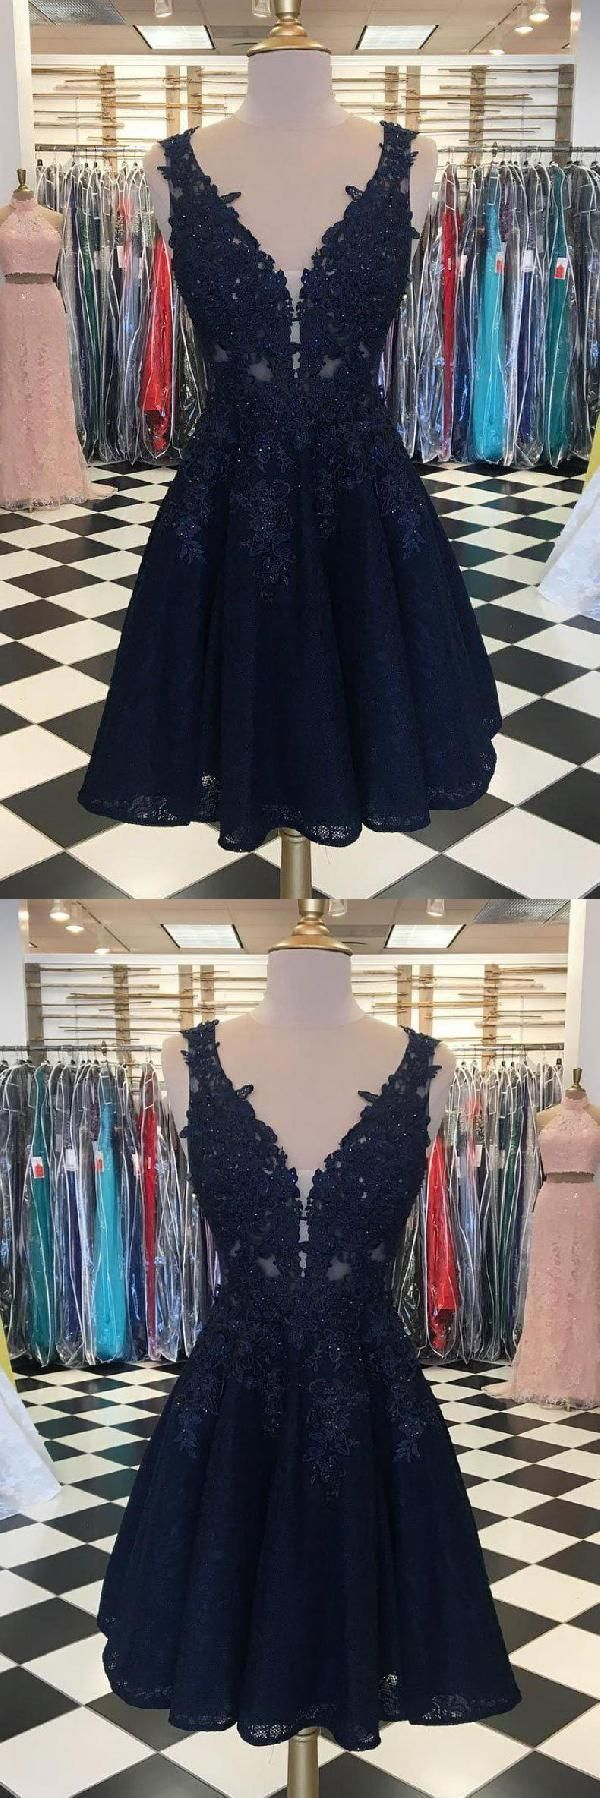 Discount substantial black prom dresses black lace prom dresses